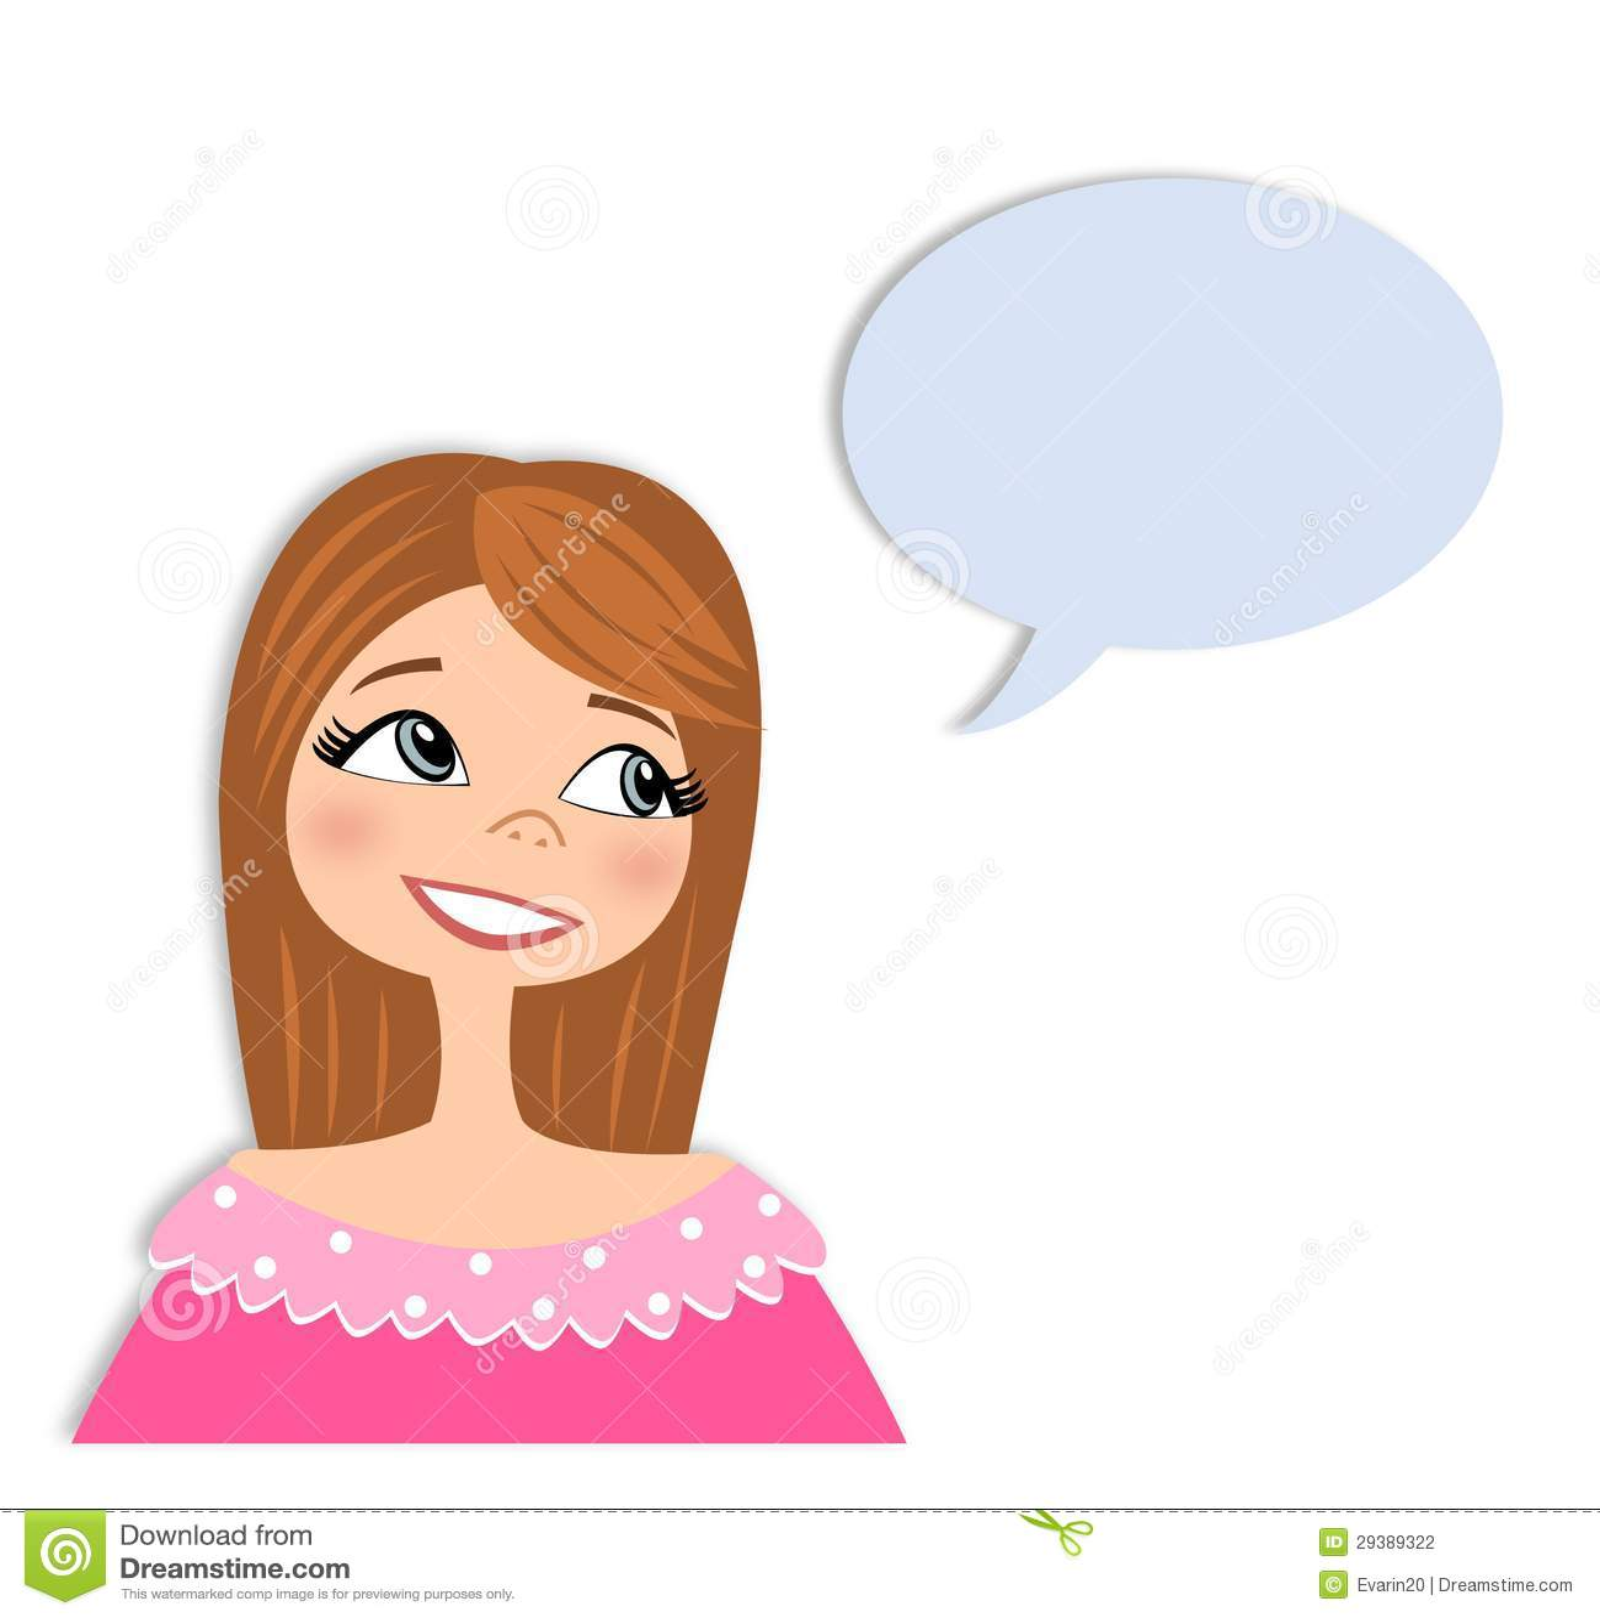 girl in conversation cartoon character stock photography gossip girl clipart gossip clipart free